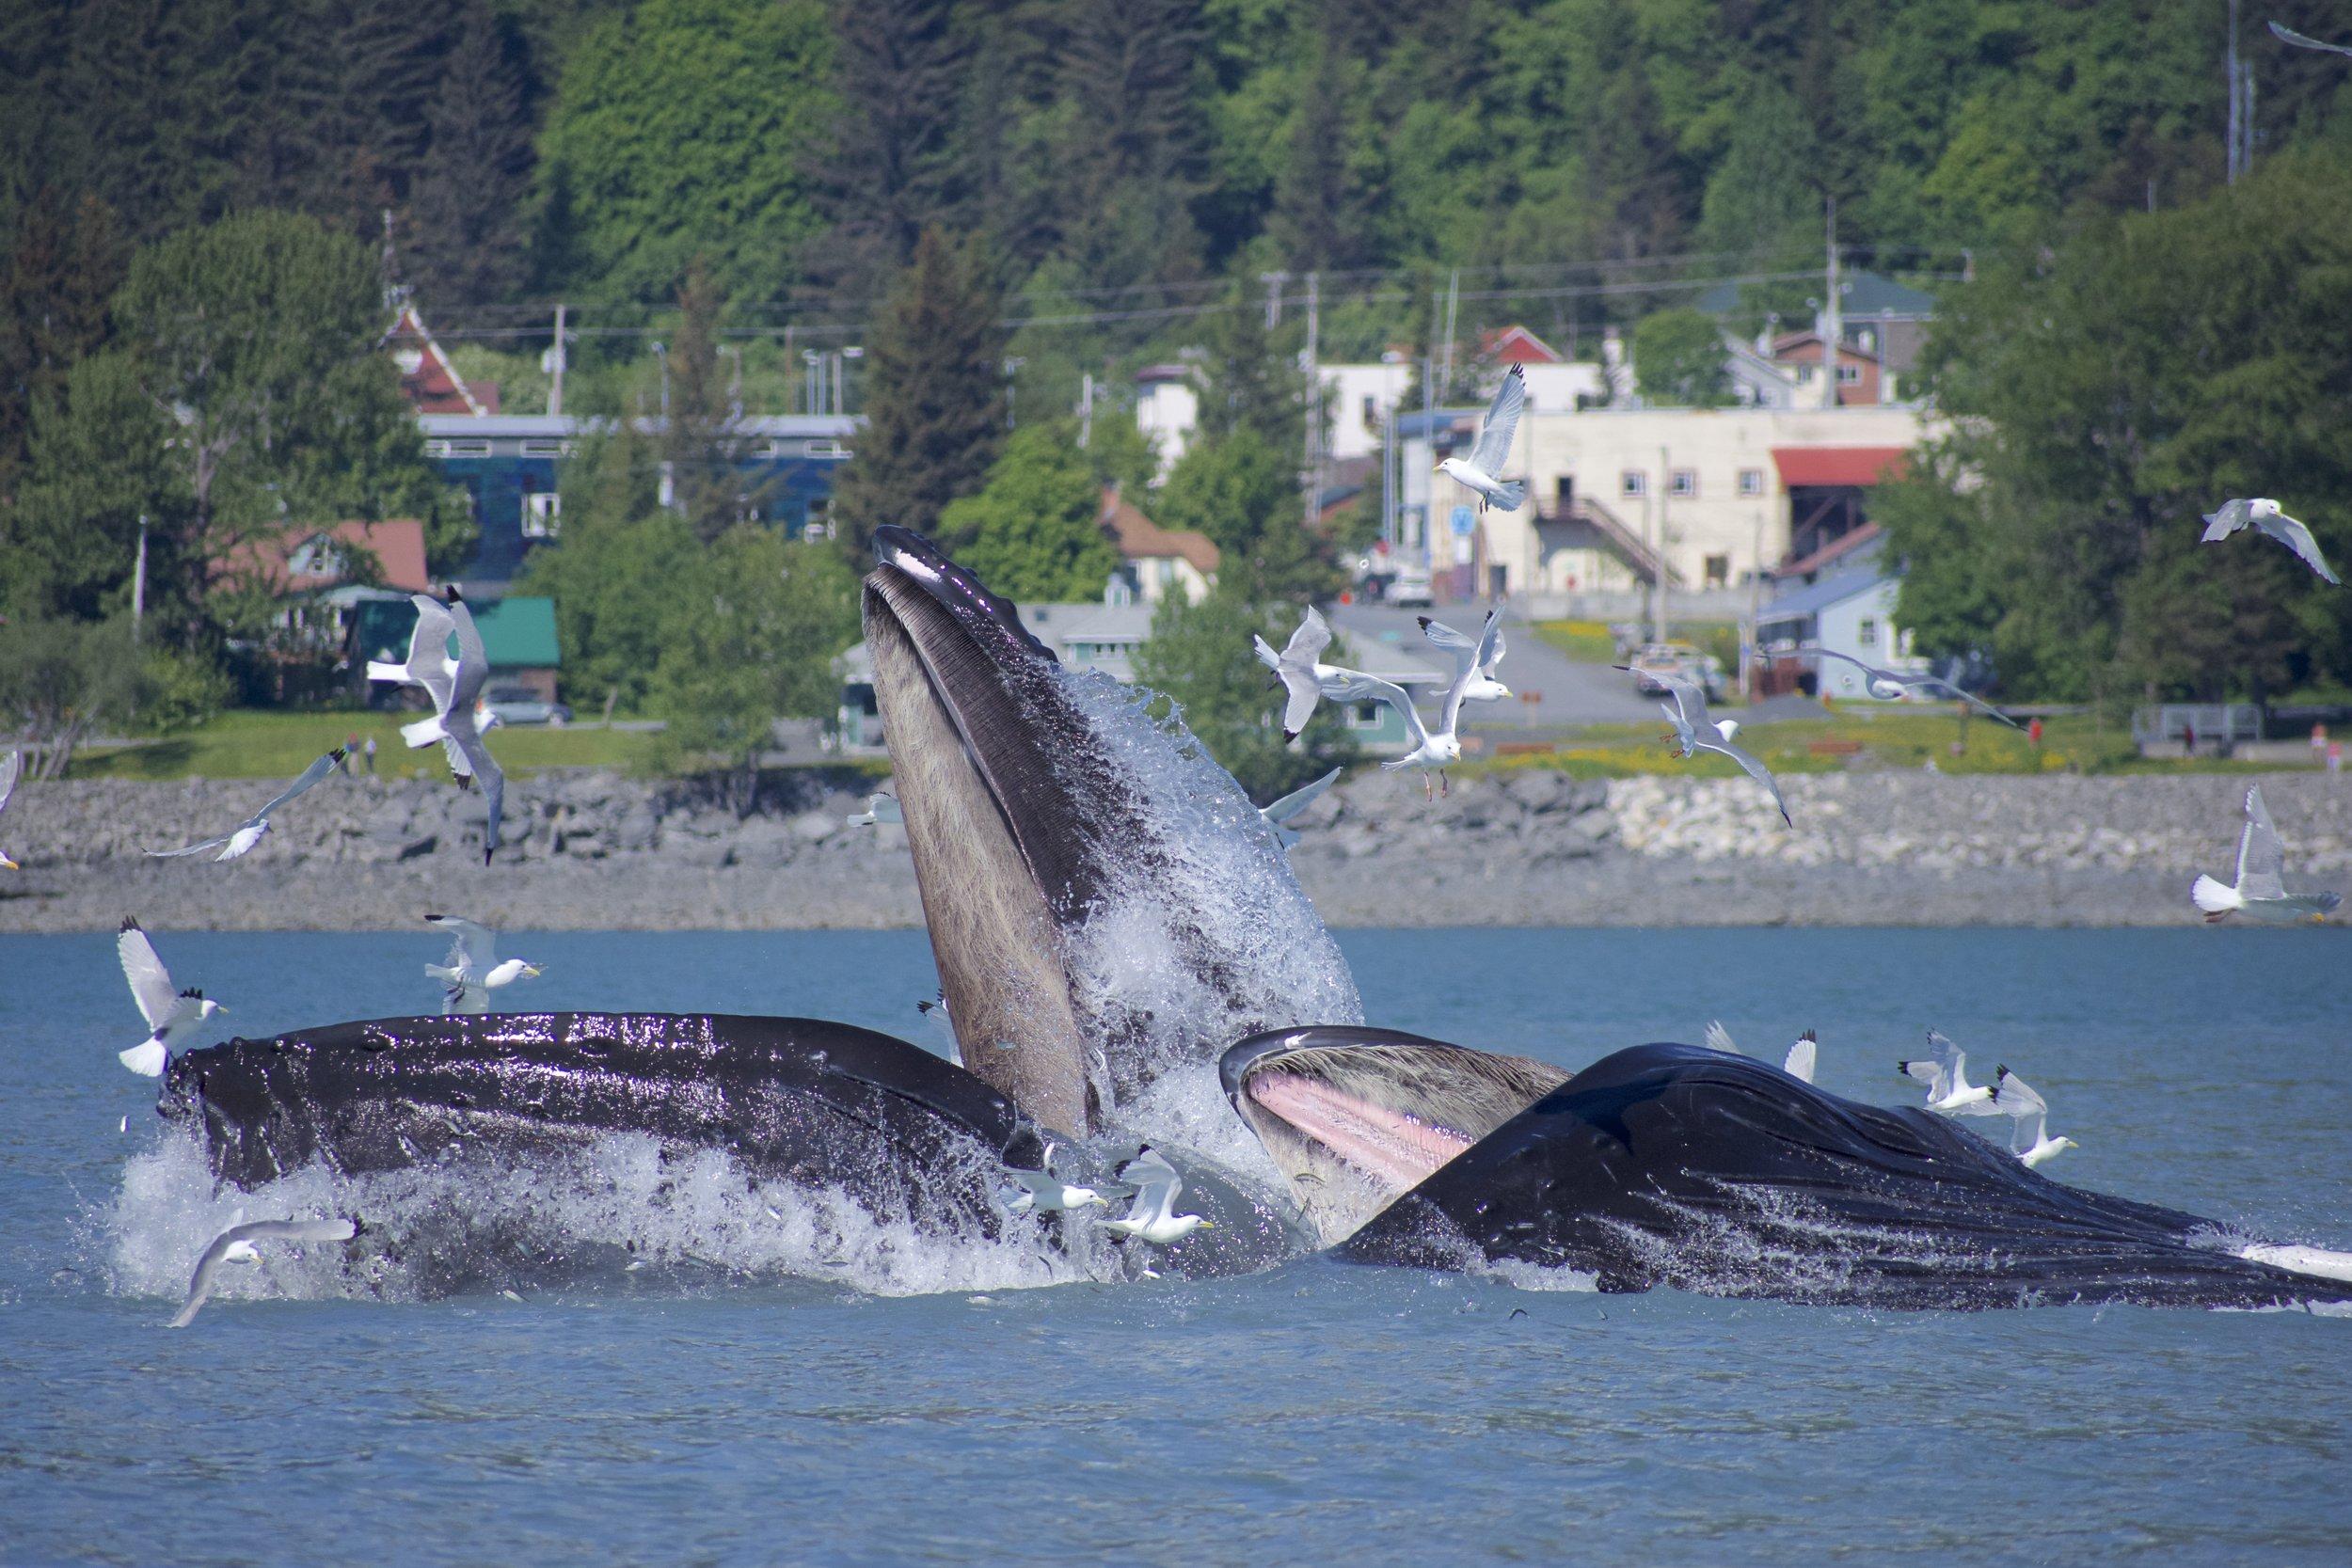 A pod of humpbacks bubble feeding in the bay.